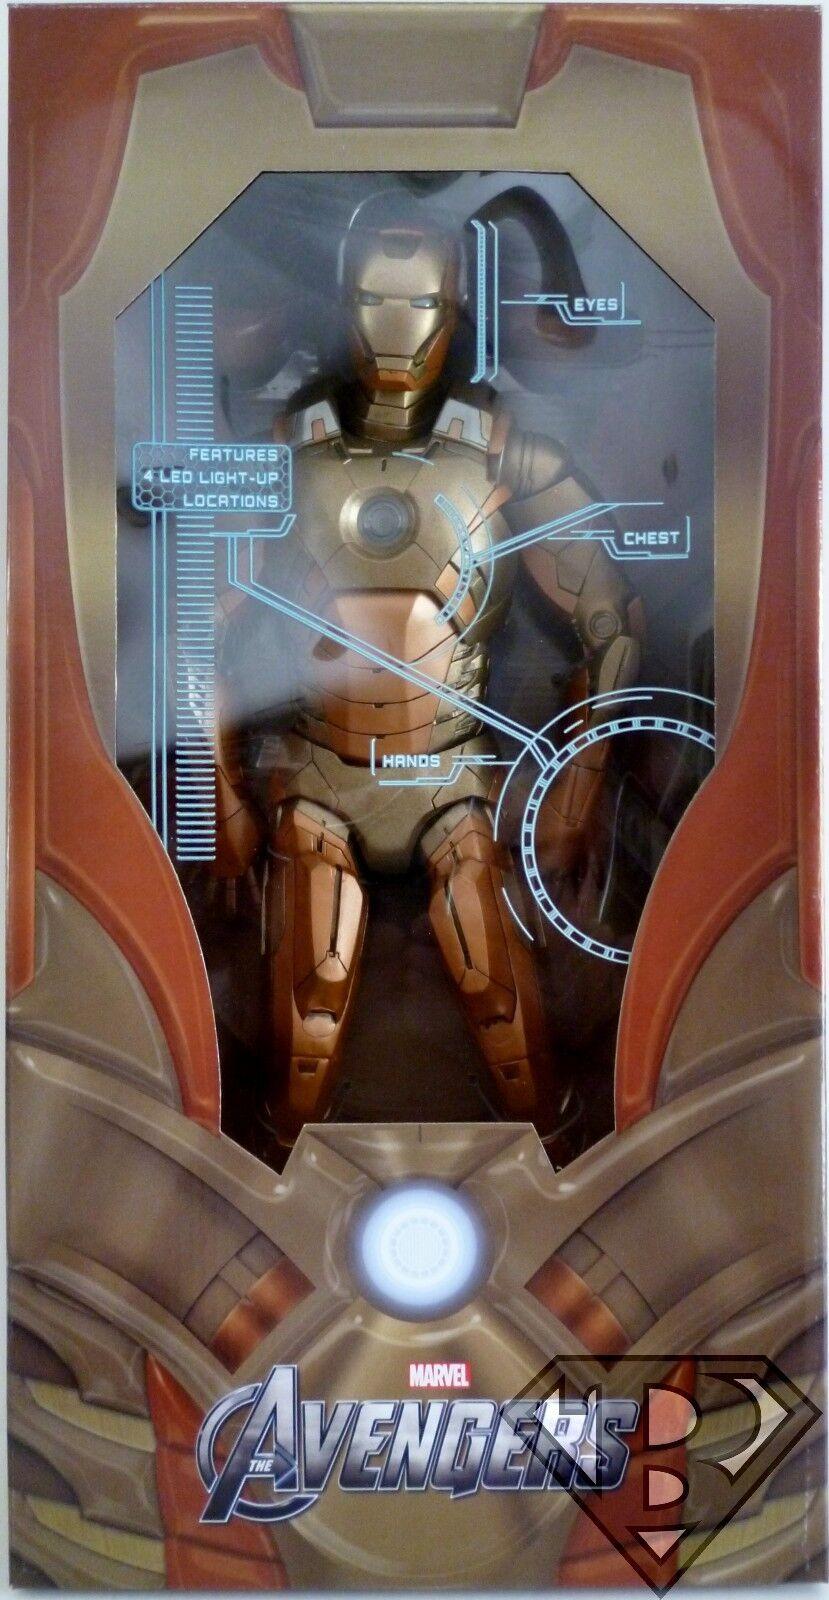 IRON MAN MIDAS VERSION gold ARMOR The Avengers 18  1 4 Scale Figure Neca 2014